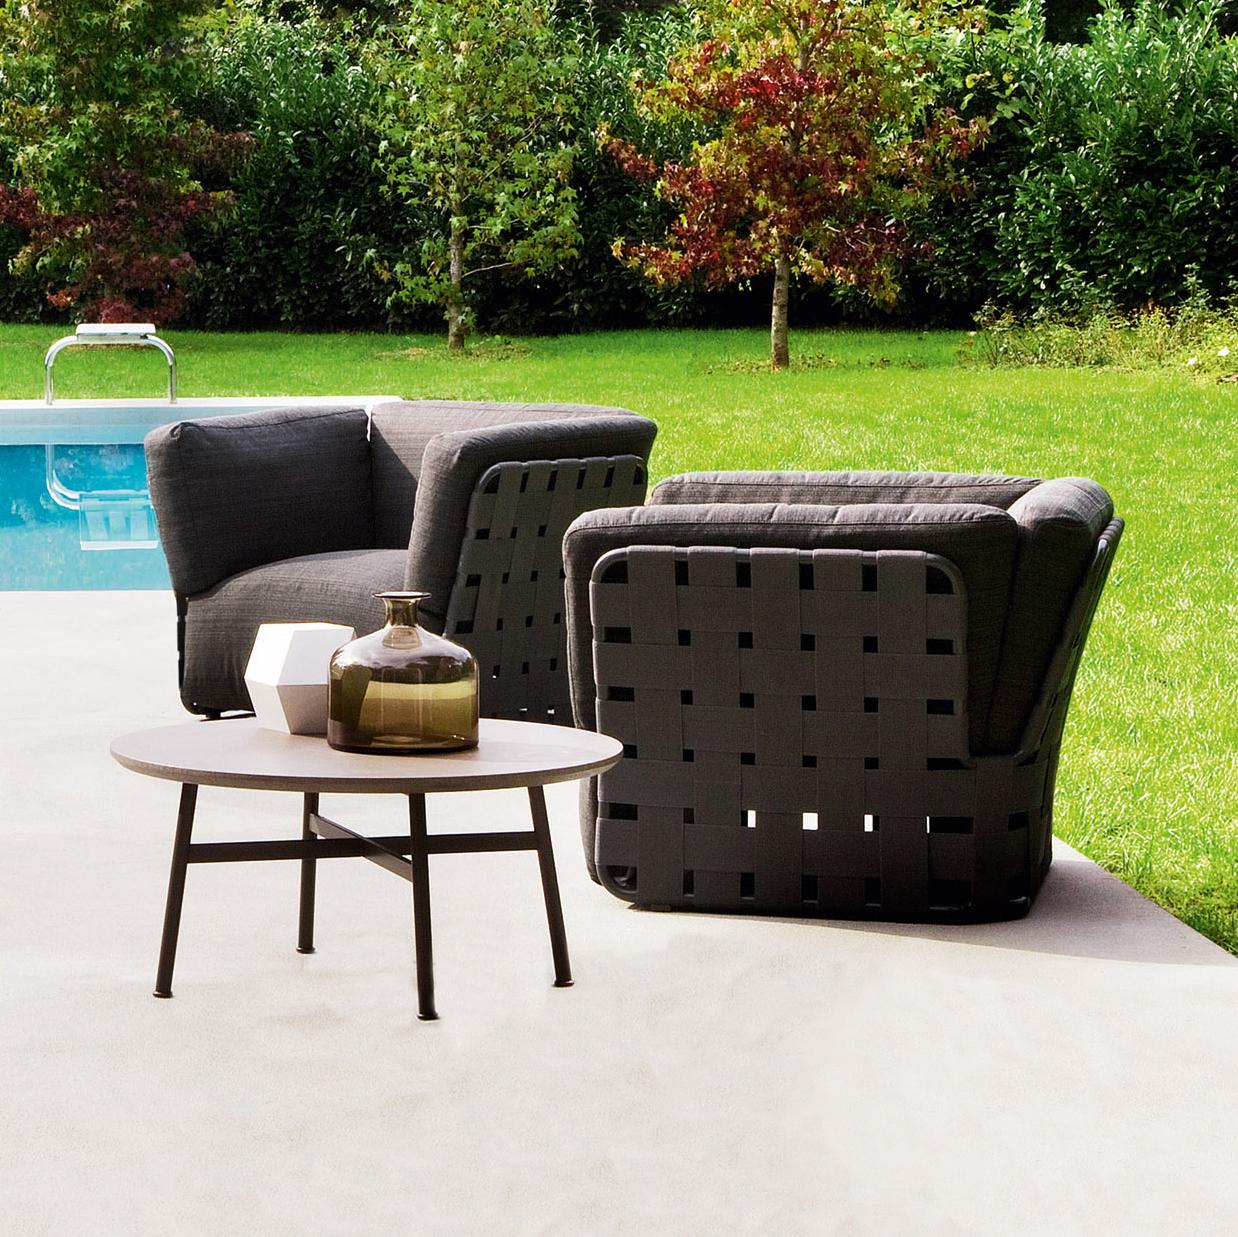 Obi lounge chair for Quick pool obi